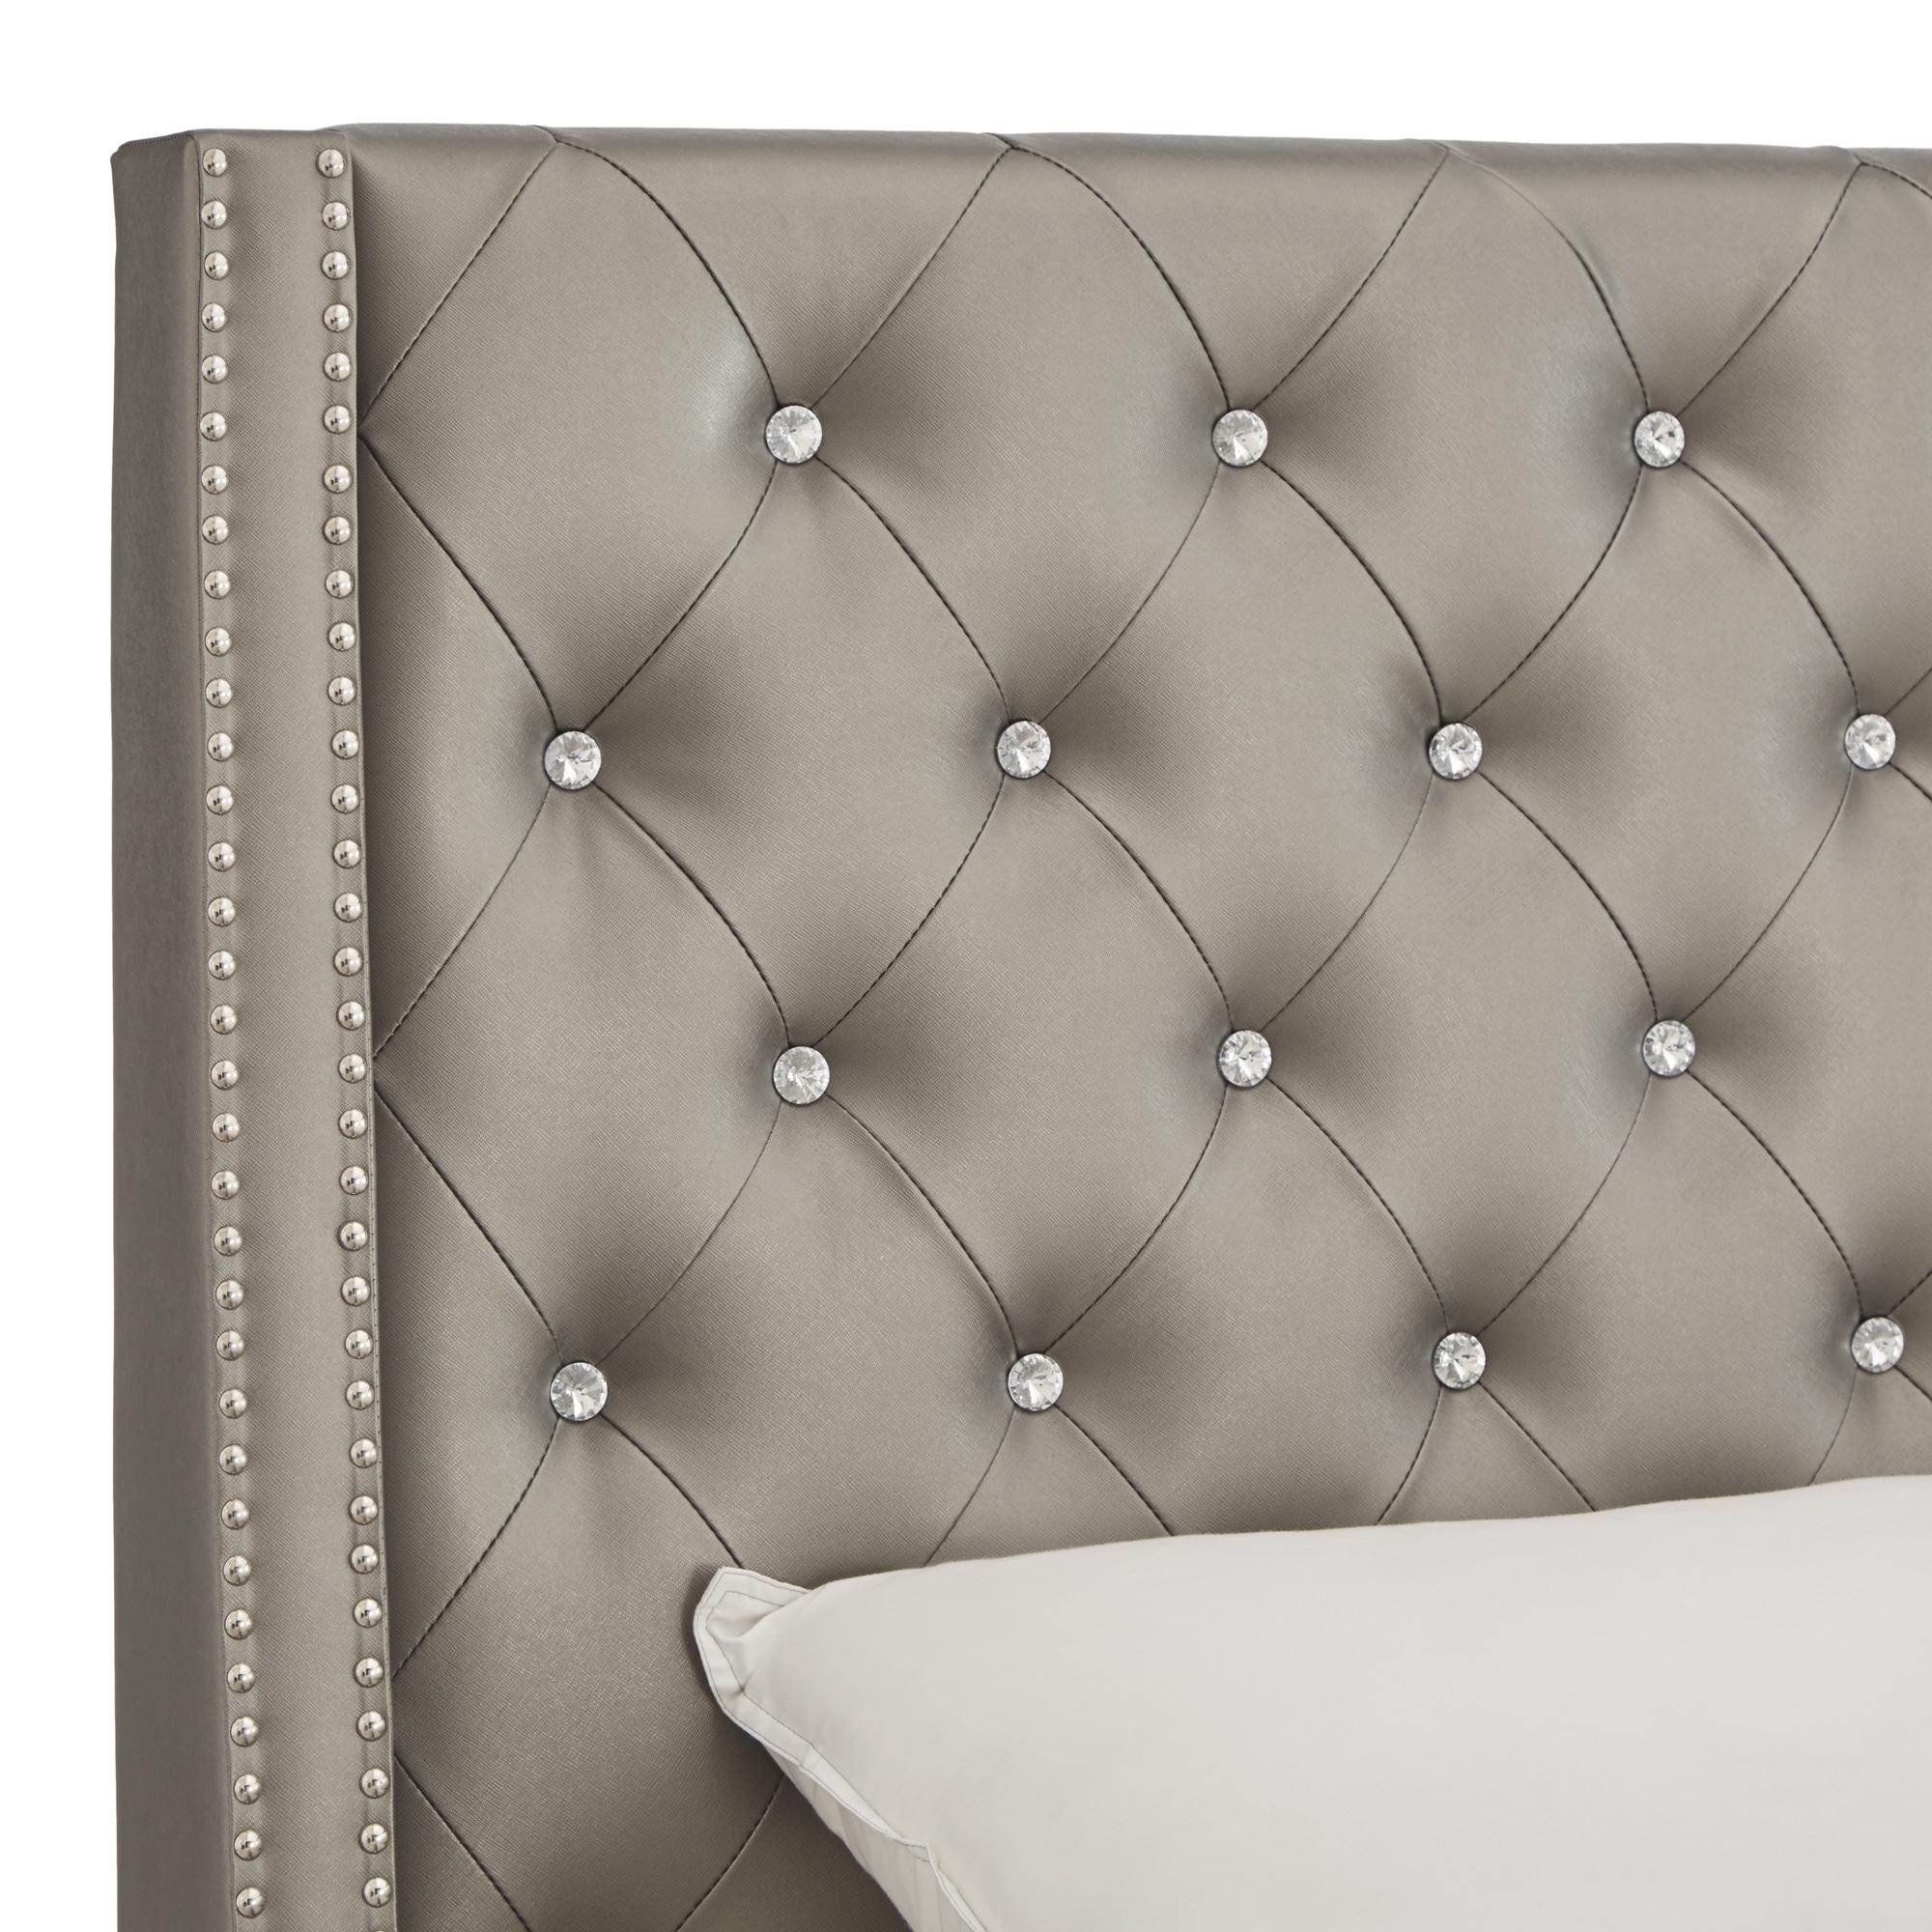 upholstered save tufted headboards gray headboard ll furniture grey panel corbett you love